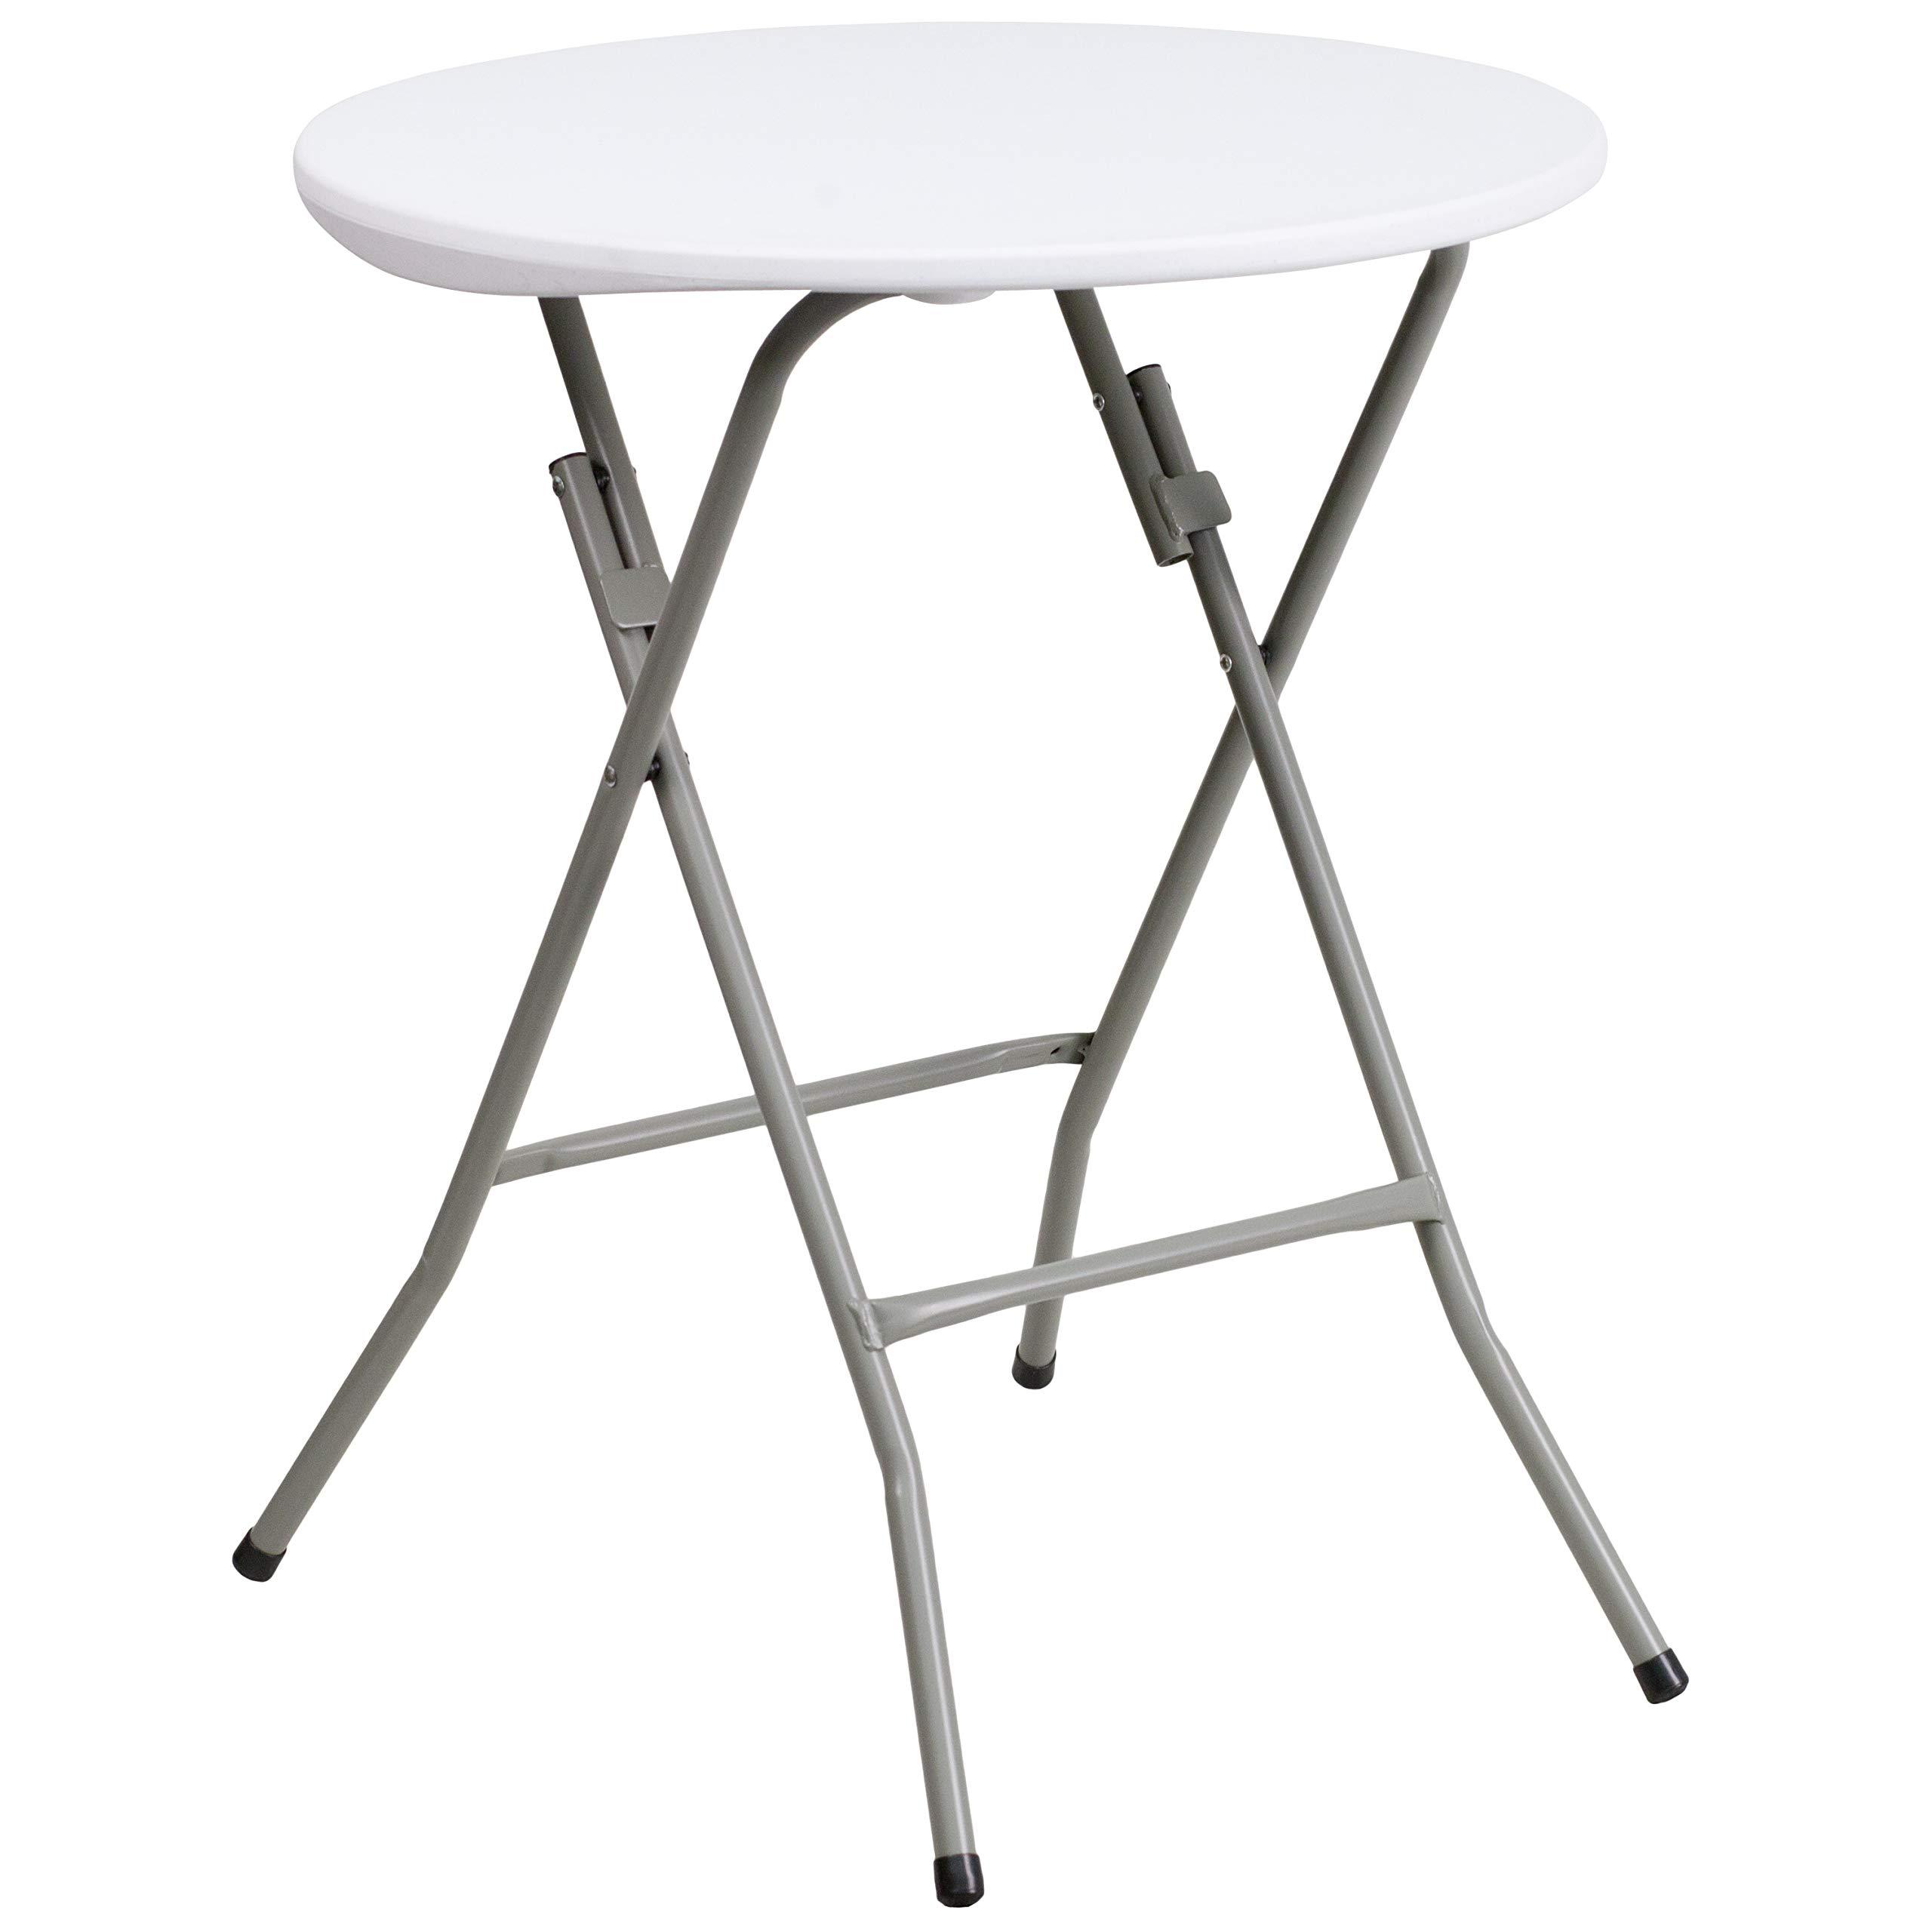 Flash Furniture 2-Foot Round Granite White Plastic Folding Table by Flash Furniture